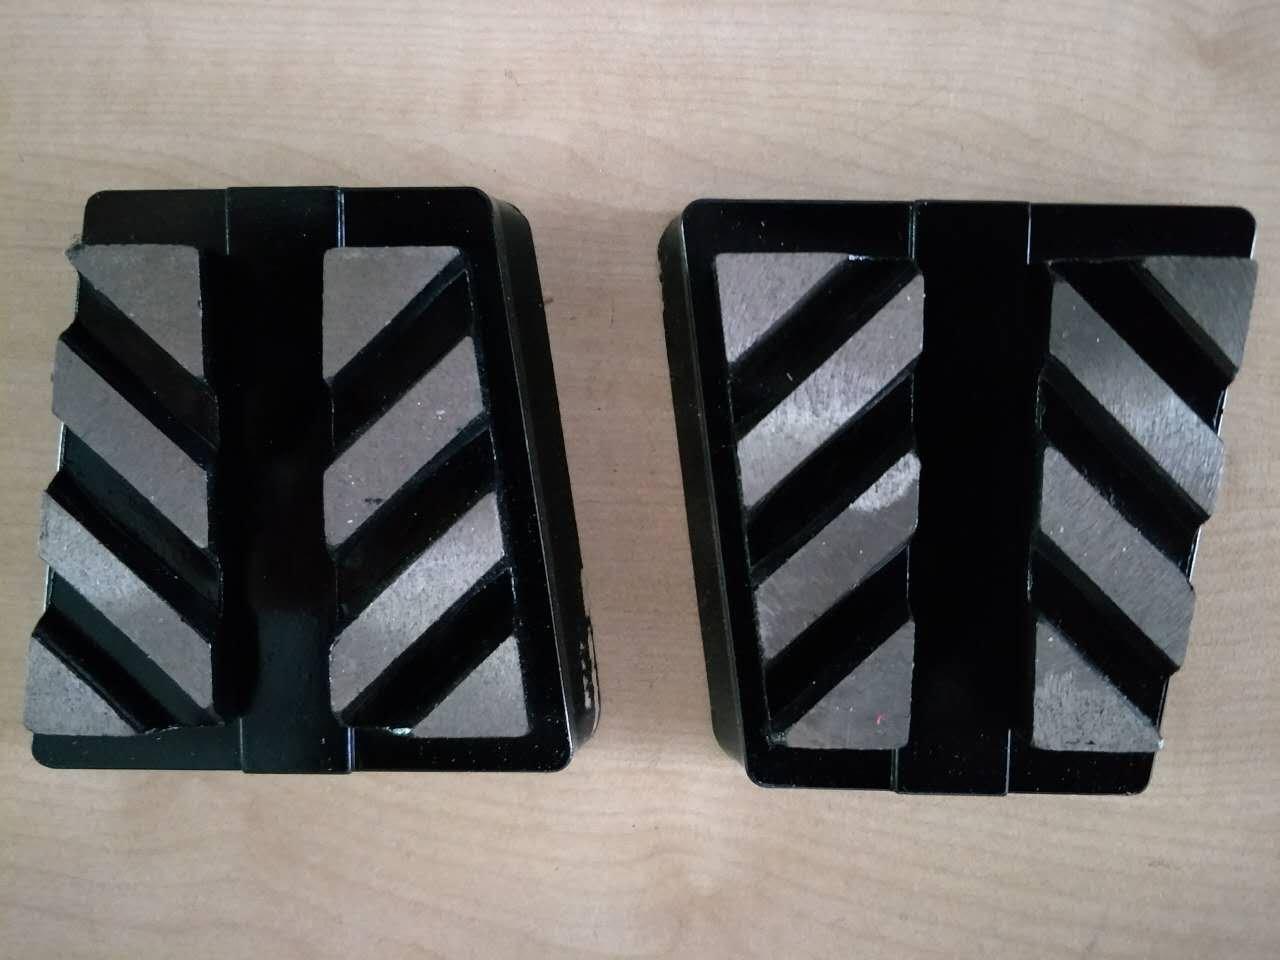 12 pieces 180# Frankfurt abrasive grinding shoe blocks for concrete terrazzo